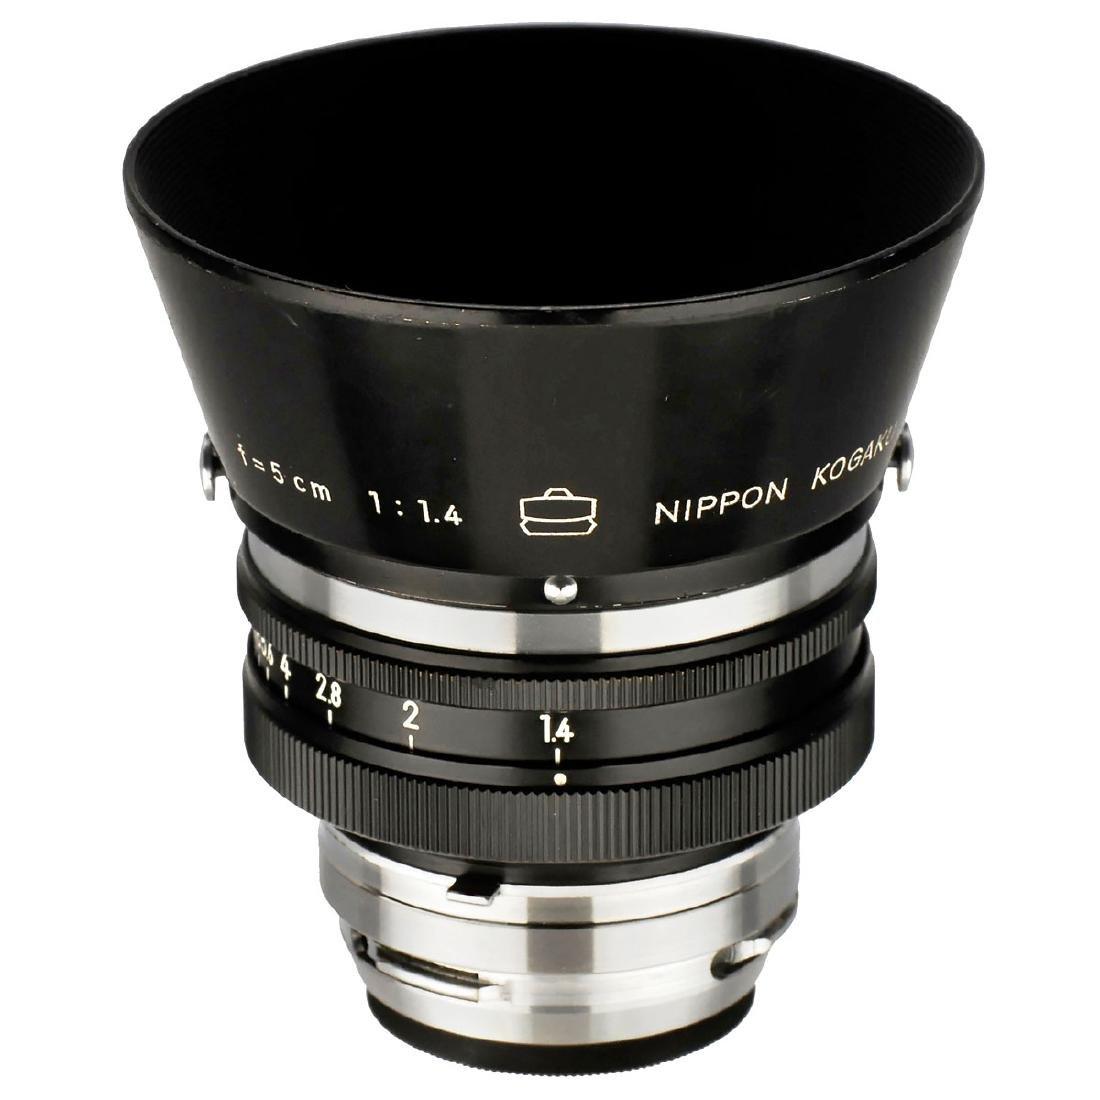 3 Nikkor Lenses - 2